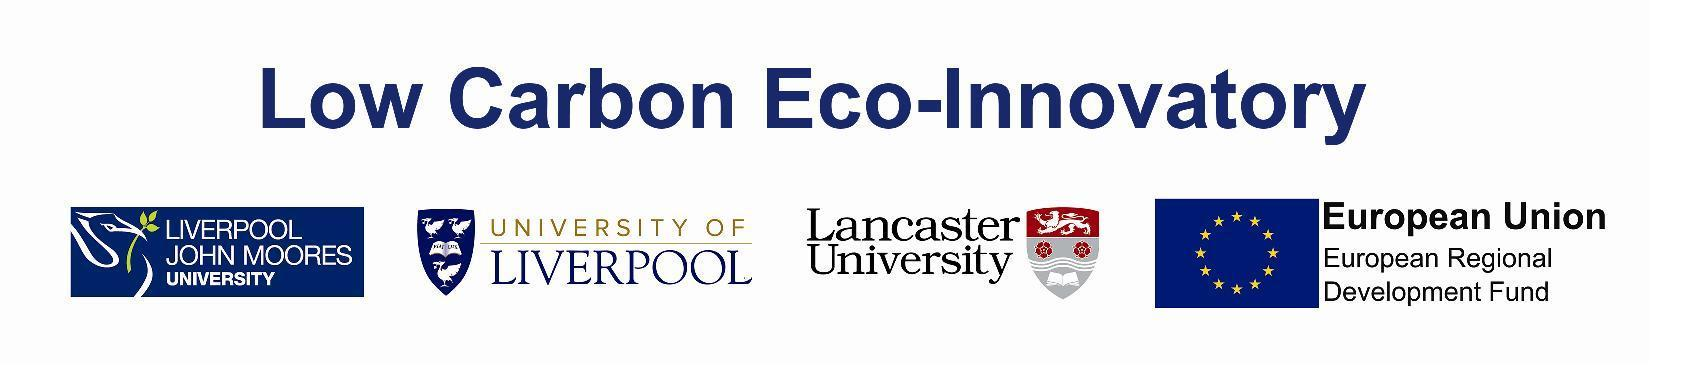 low-carbon-eco-innovatory-lcei-logo